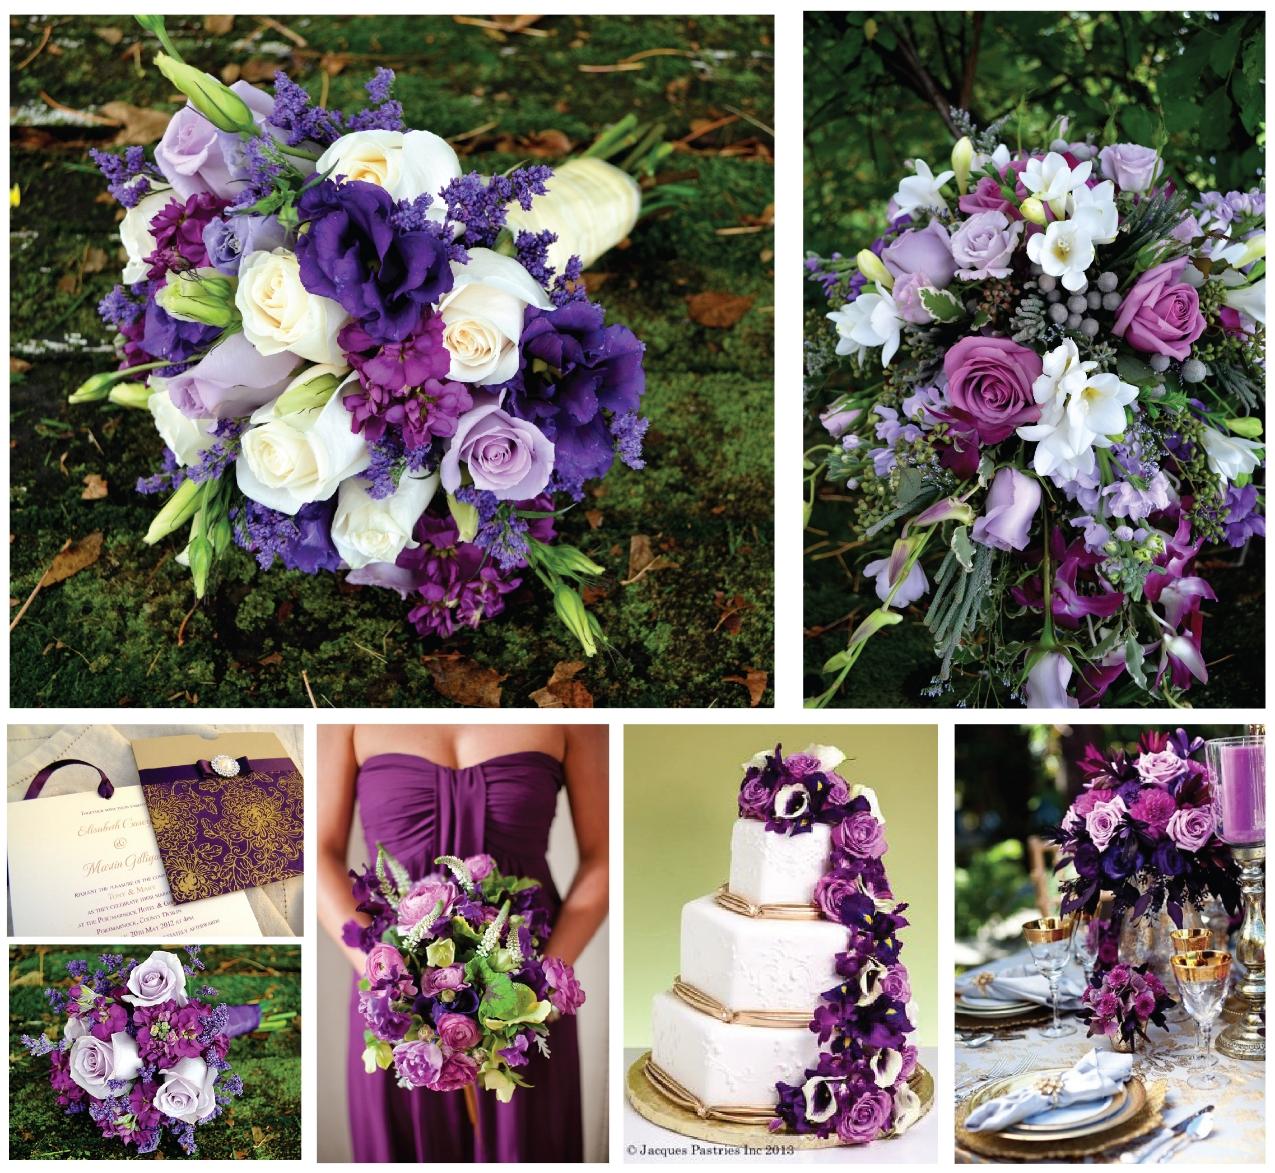 weddings_majestic-01-984509-edited